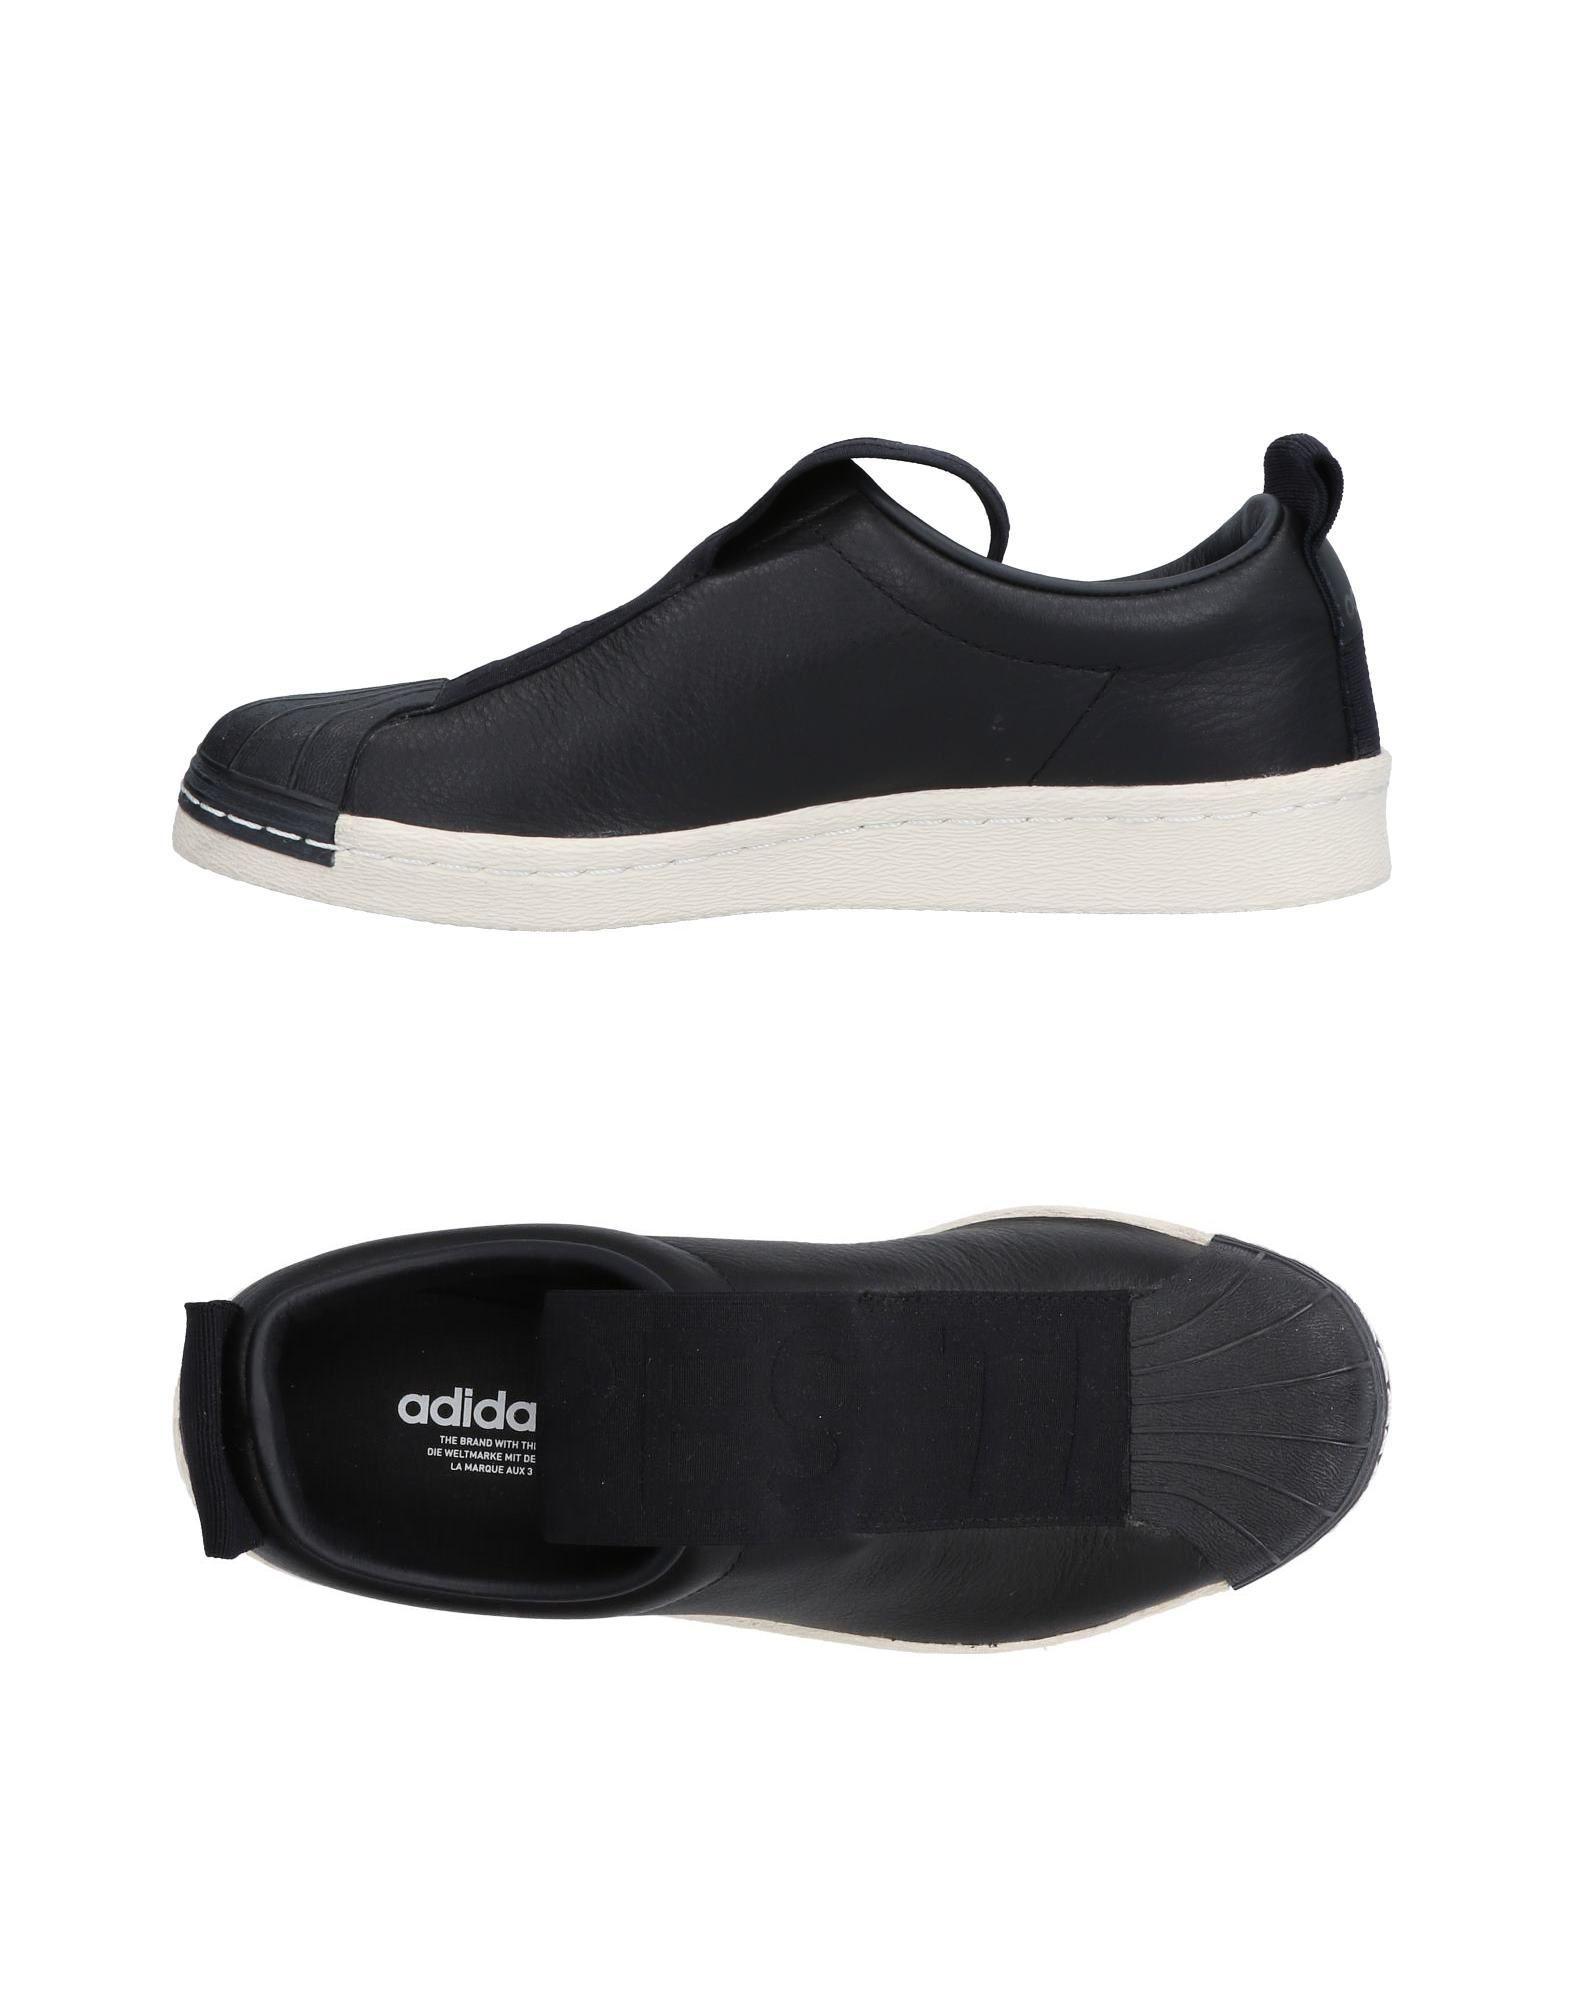 Adidas Originals Originals Sneakers - Women Adidas Originals Originals Sneakers online on  United Kingdom - 11491064AW 4cab6c